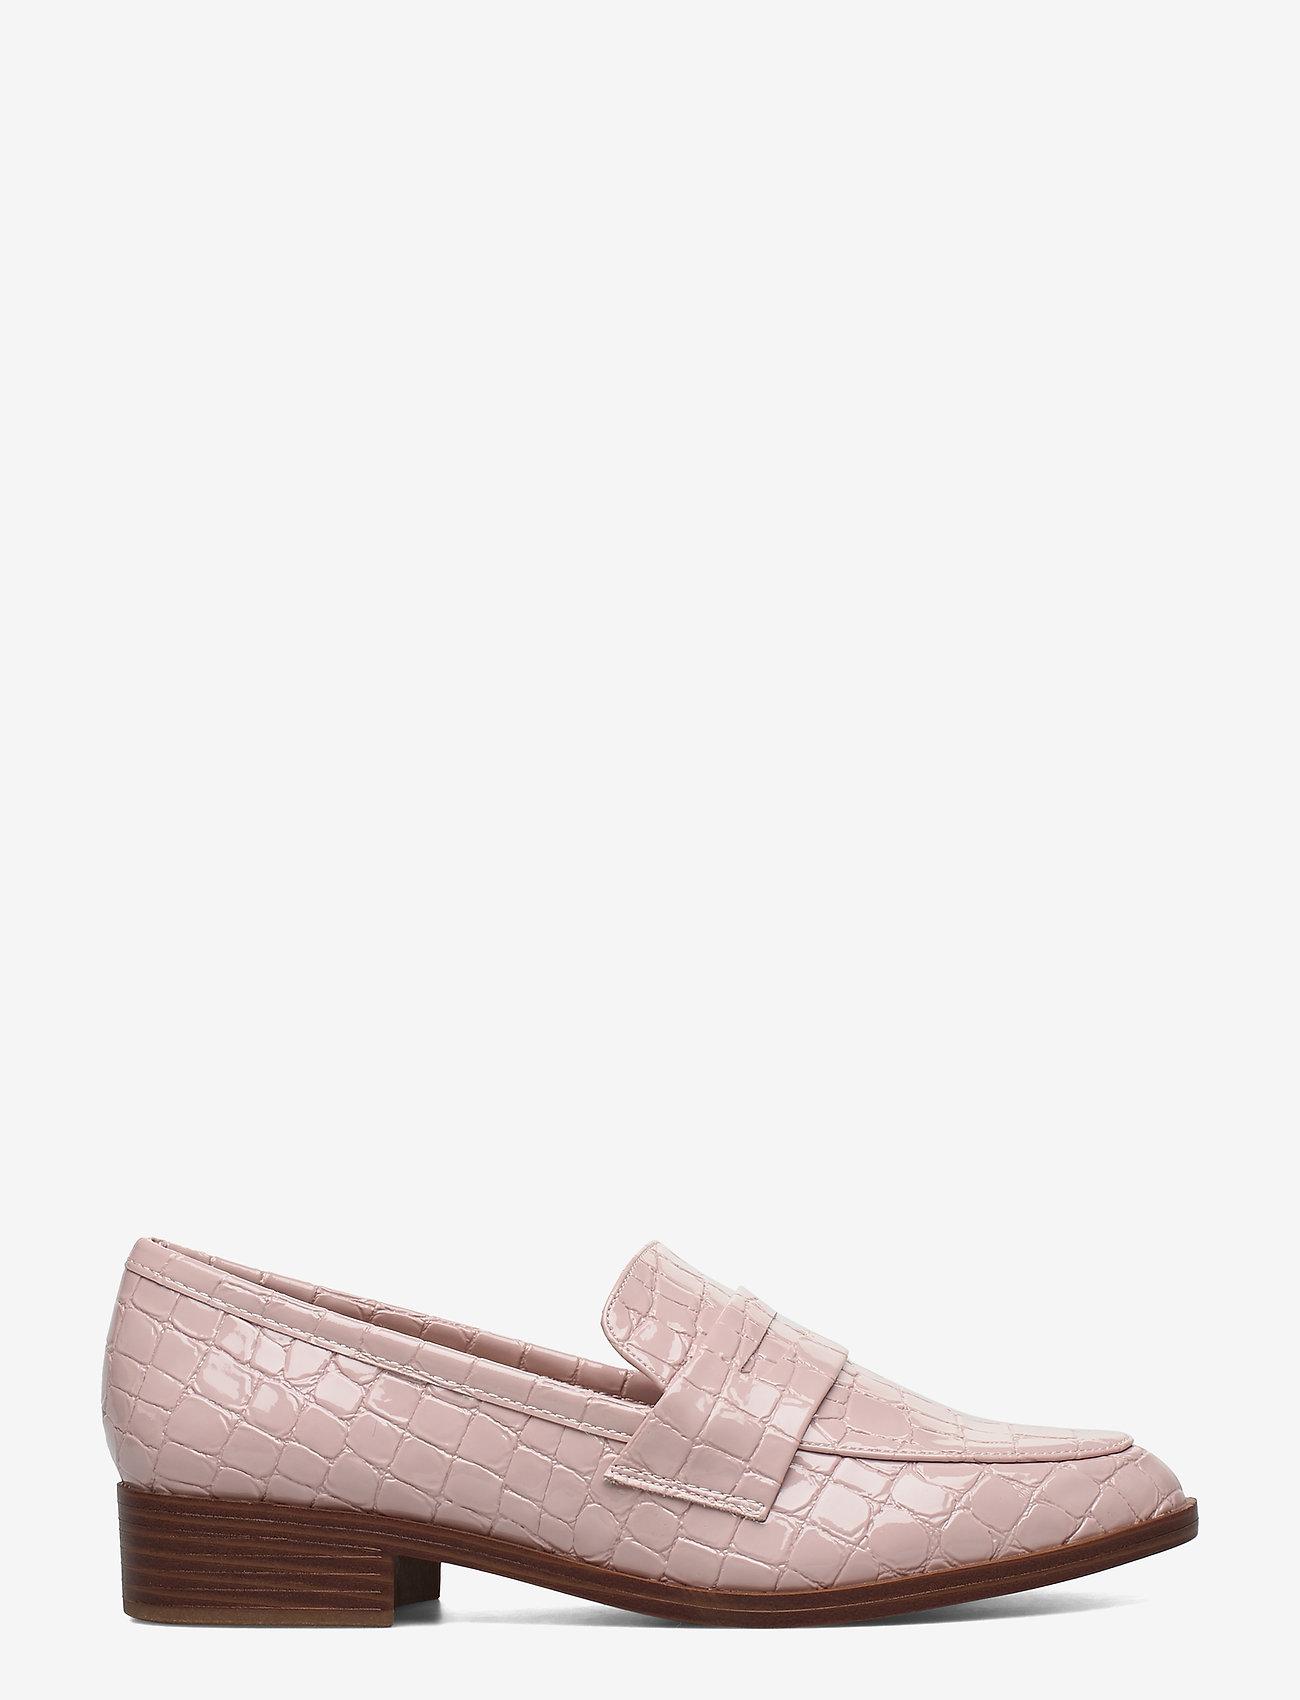 Aldo - LANGLET - mokasiner - light pink